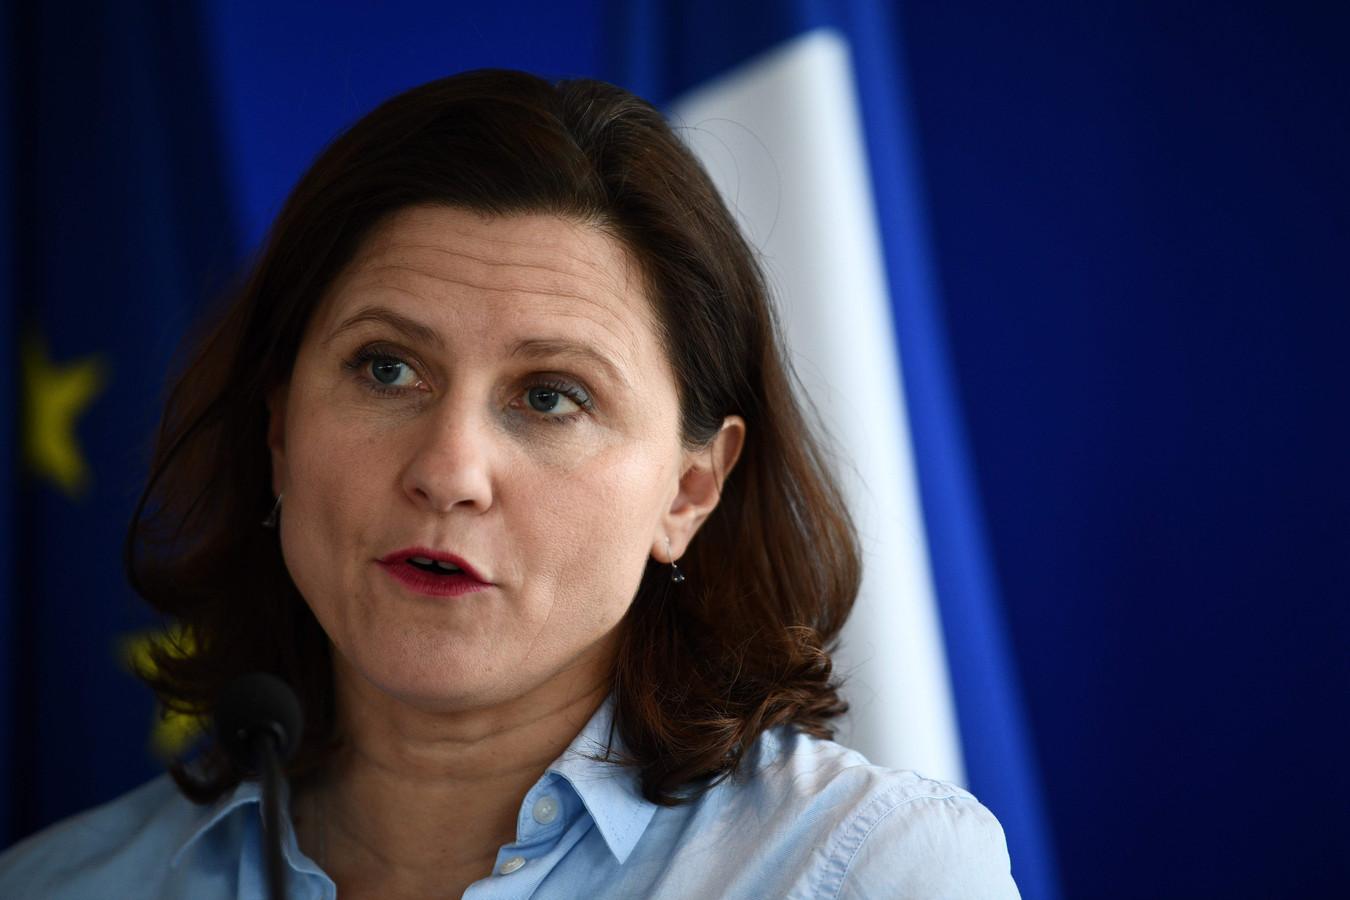 La ministre française des Sports Roxana Maracineanu.